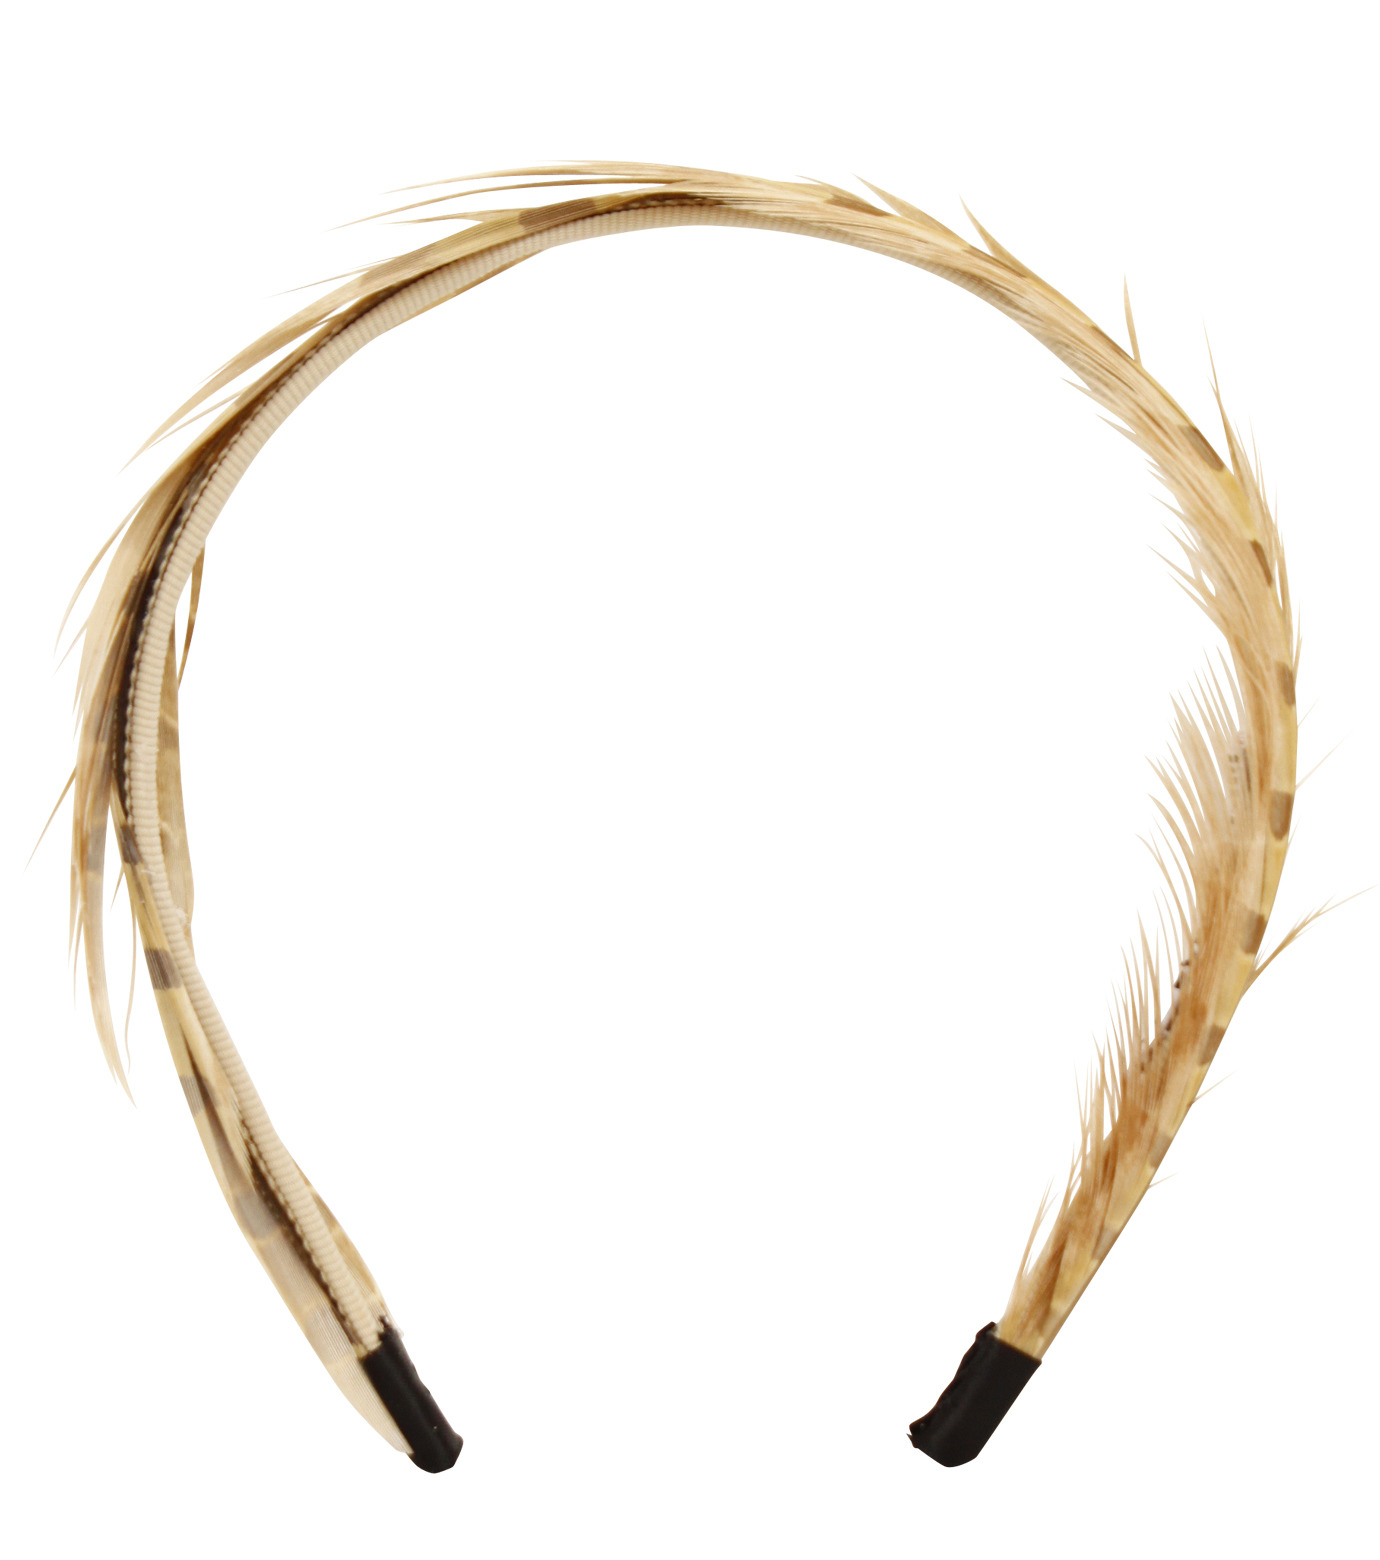 LE CIEL BLEU(ルシェルブルー)のFeather headband / Eugenia Kim-LIGHT BROWN(アクセサリー/accessory)-2323-1459-L 拡大詳細画像1